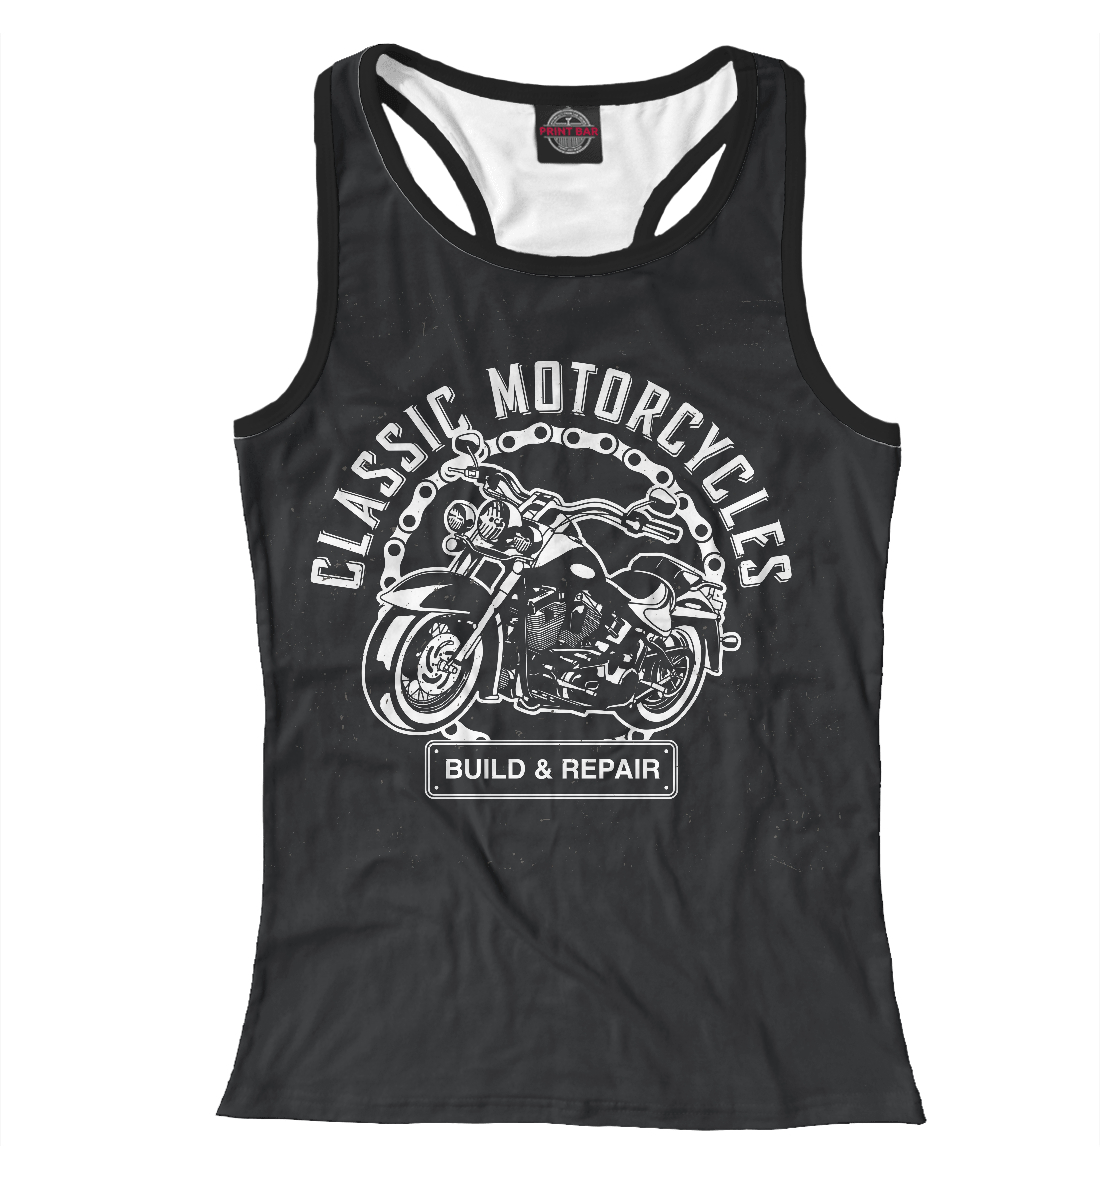 Купить Motorcycles, Printbar, Майки борцовки, MTR-990811-mayb-1